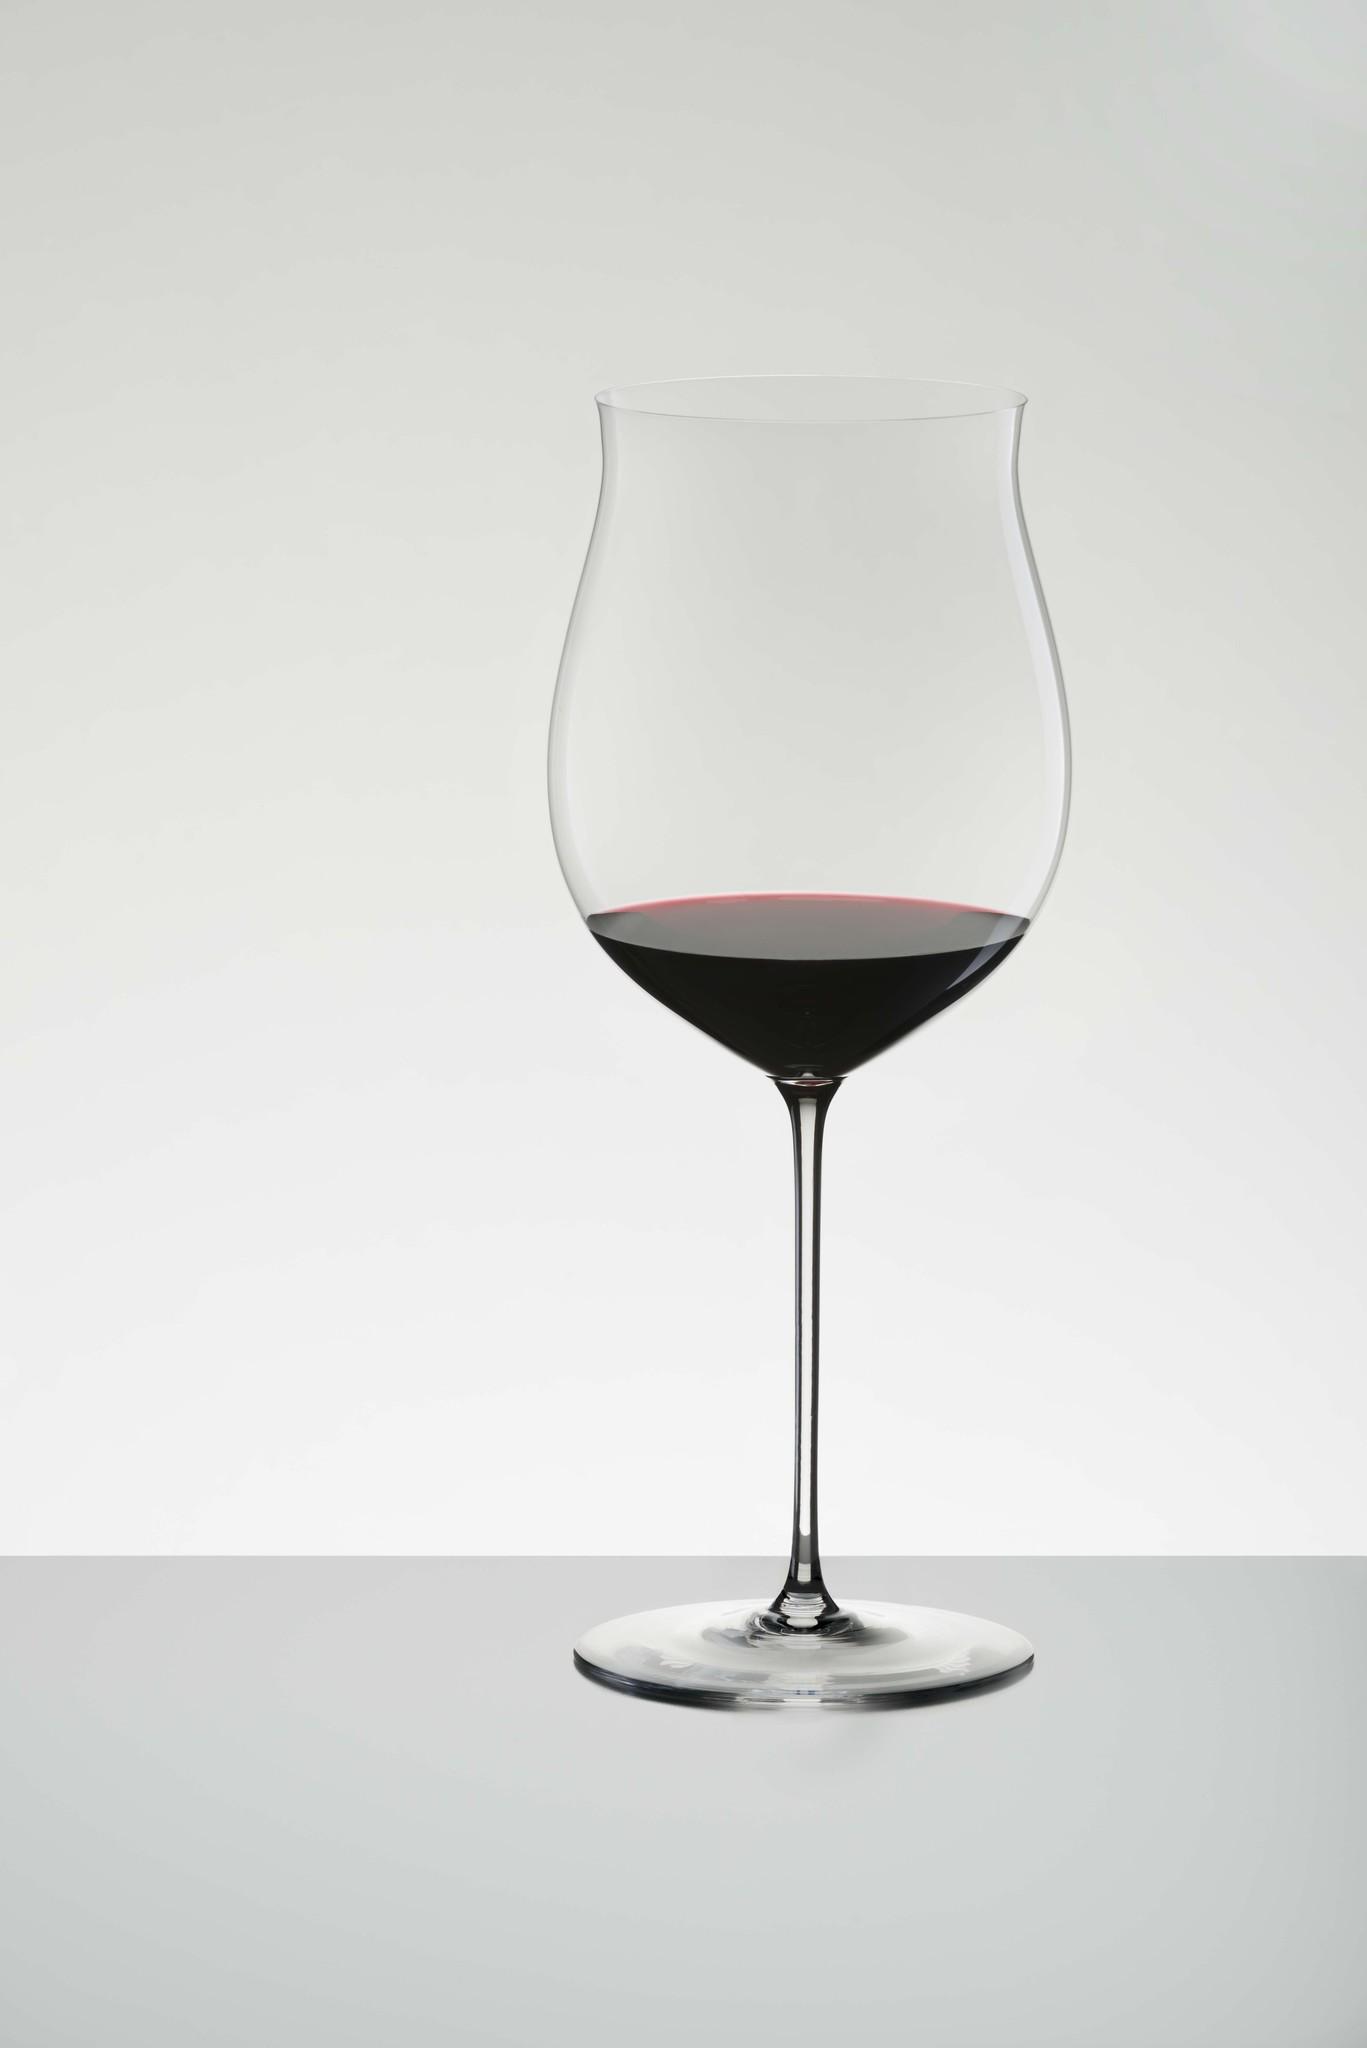 Бокалы Бокал для красного вина 1050мл Riedel Superleggero Burgundy Grand Cru bokal-dlya-krasnogo-vina-1050ml-riedel-superleggero-burgundy-grand-cru-avstriya.jpg